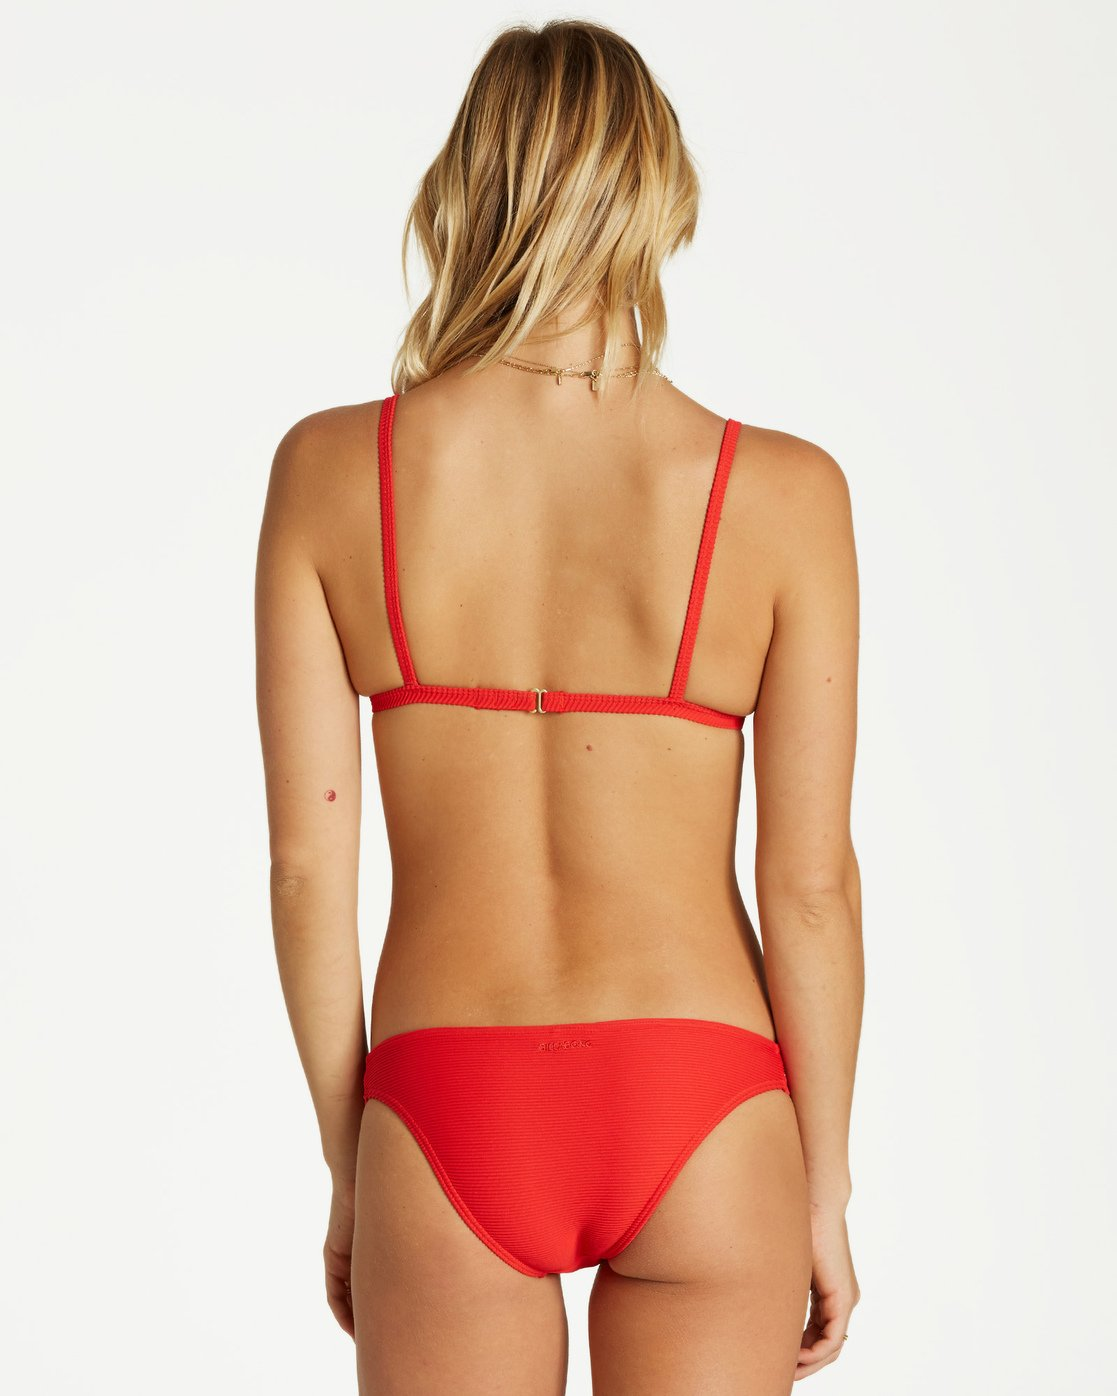 Billabong Tanlines Tropic Womens Beachwear Bikini Bottoms Fuego All Sizes